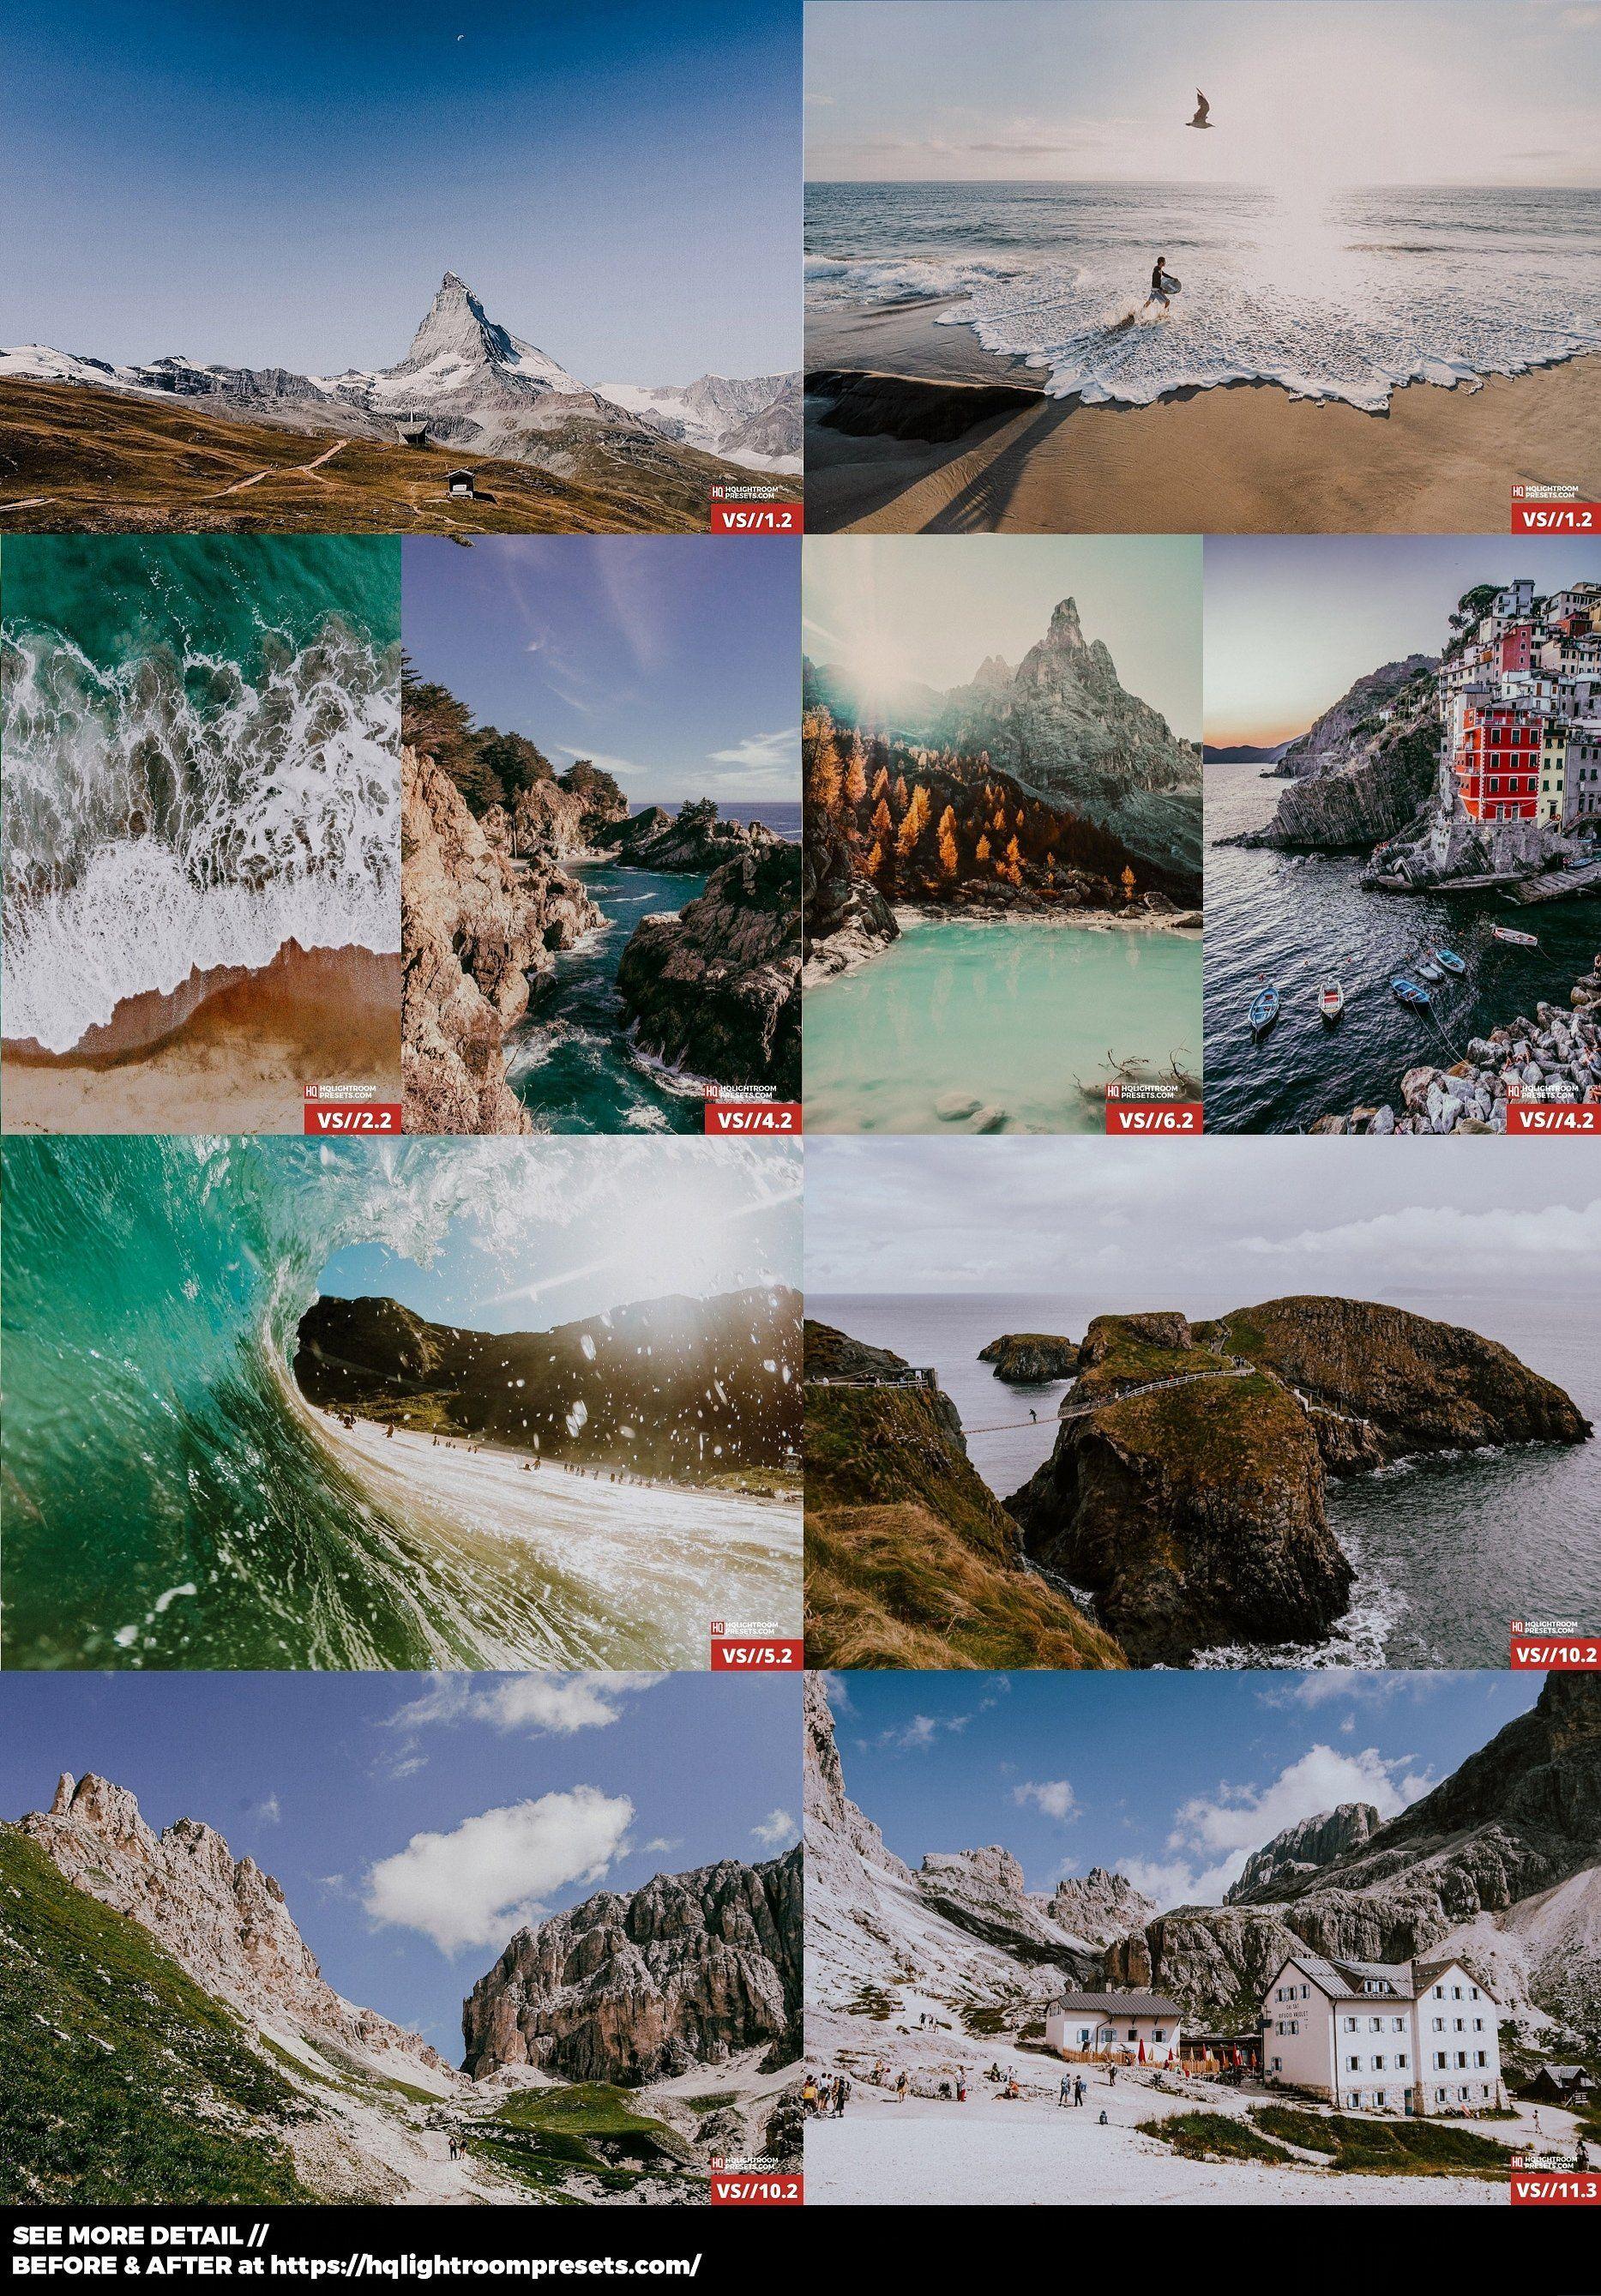 Vintrochrome 6 0 Vintroscape Aerial Photography Drone Landscape Photography Aerial Photography